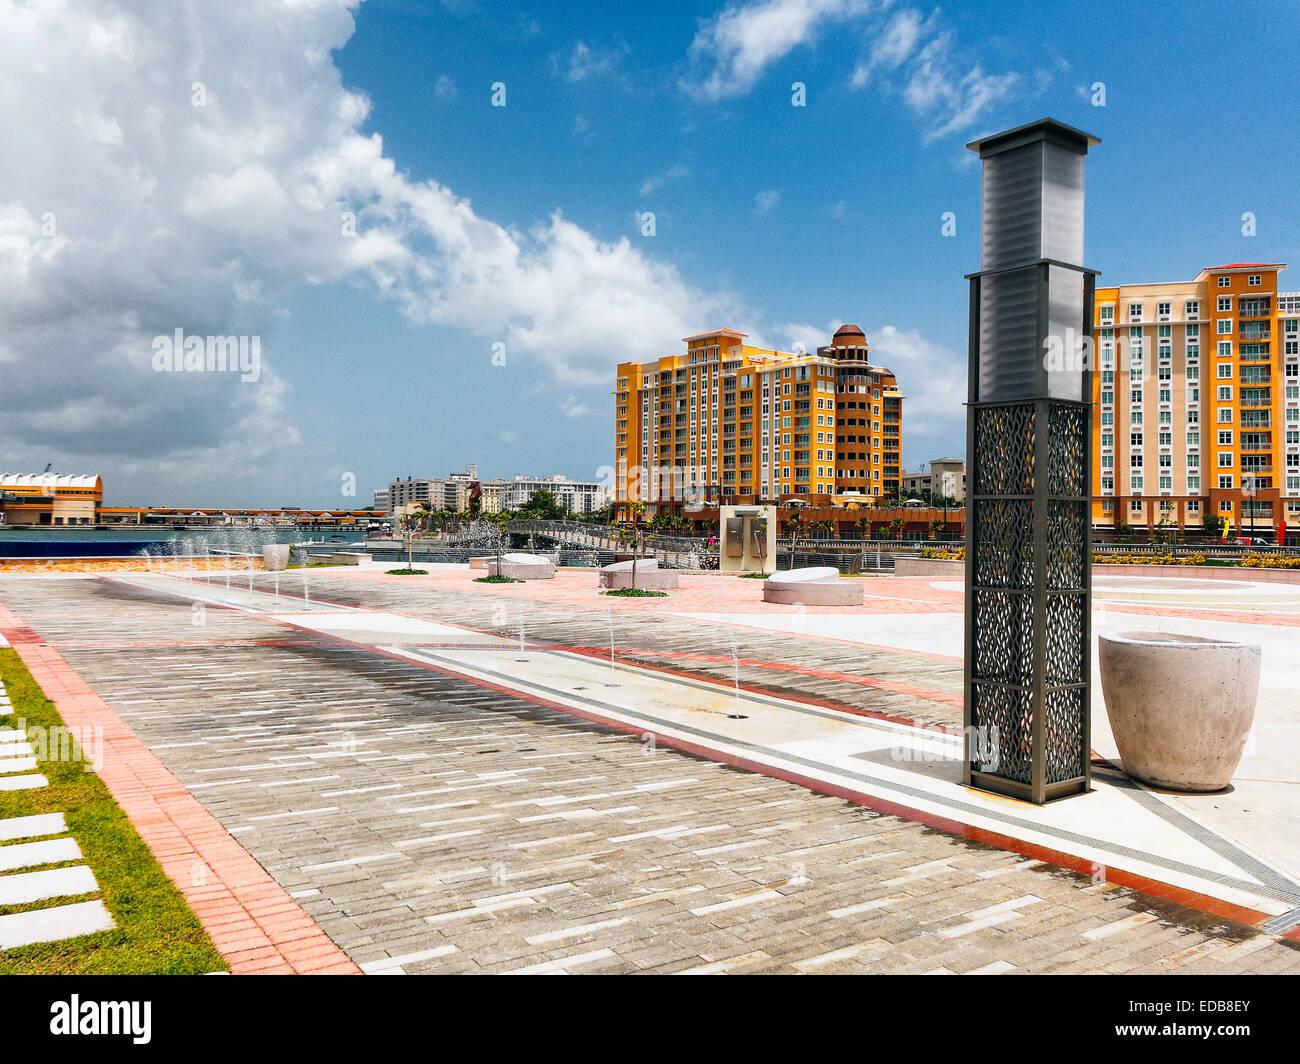 High Rise Buildings Along The Waterfront, Bahia Urbana Park, San Juan, Puerto Rico - Stock Image